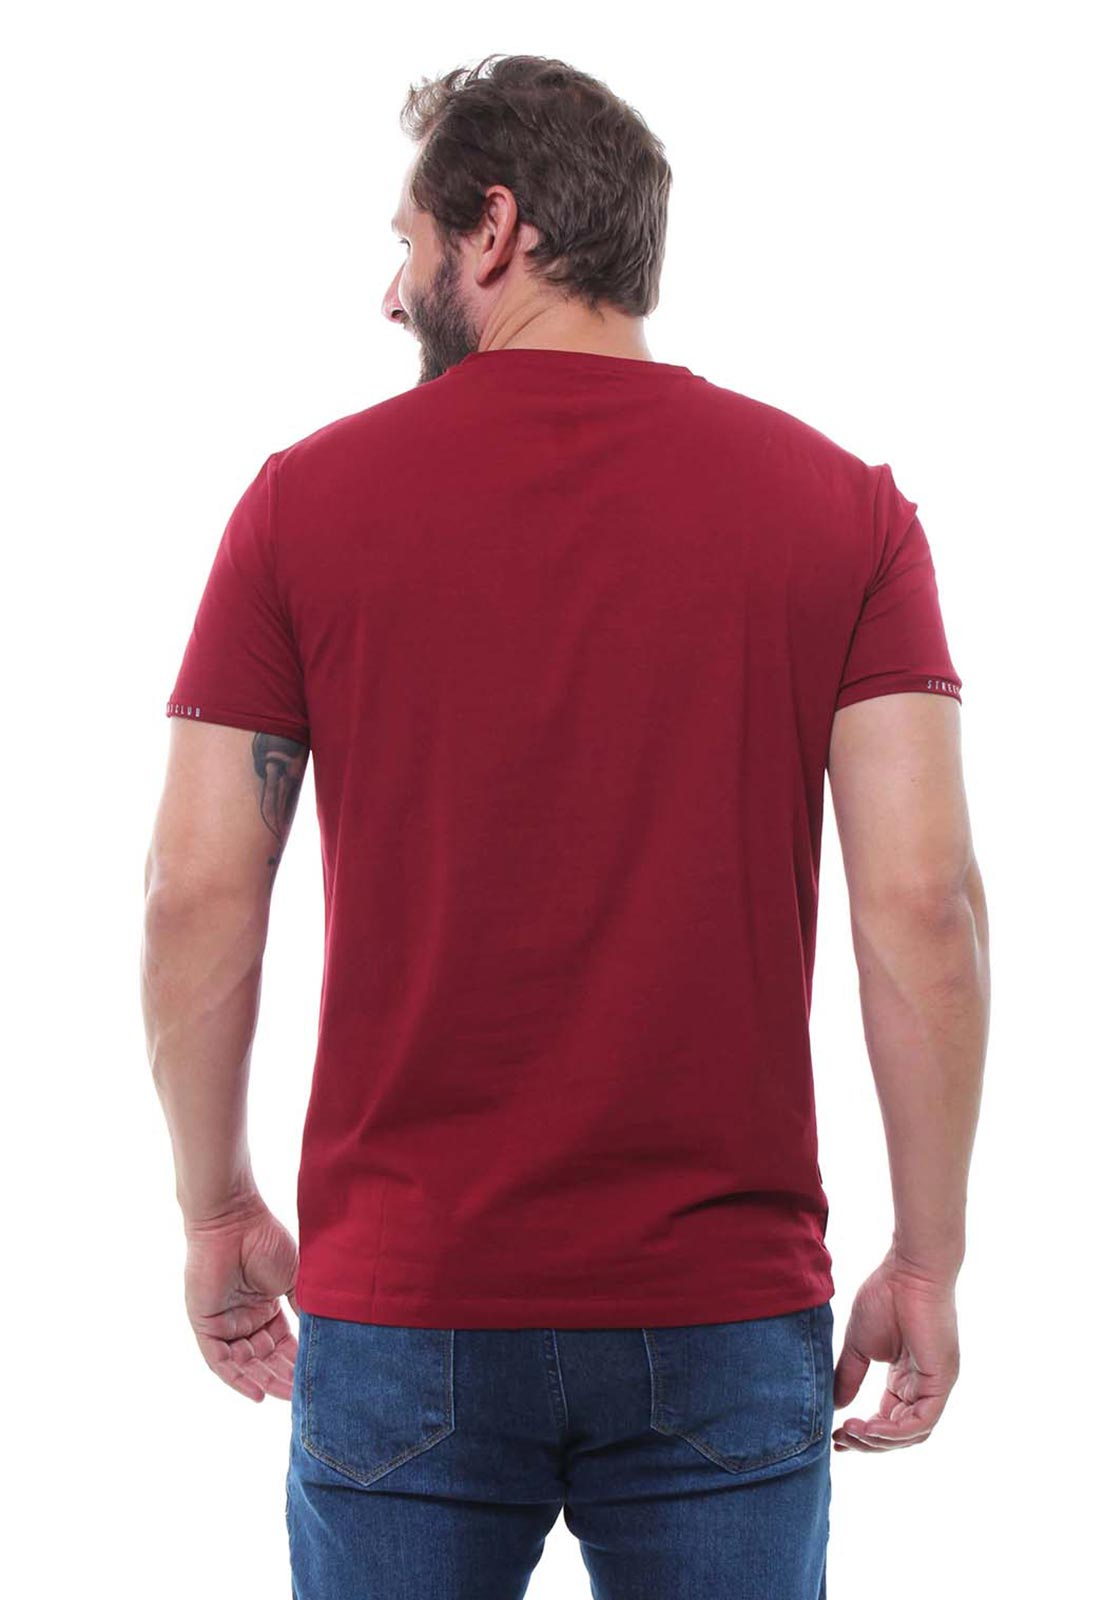 Camiseta Masculina Crocker - 47847  - CROCKER JEANS